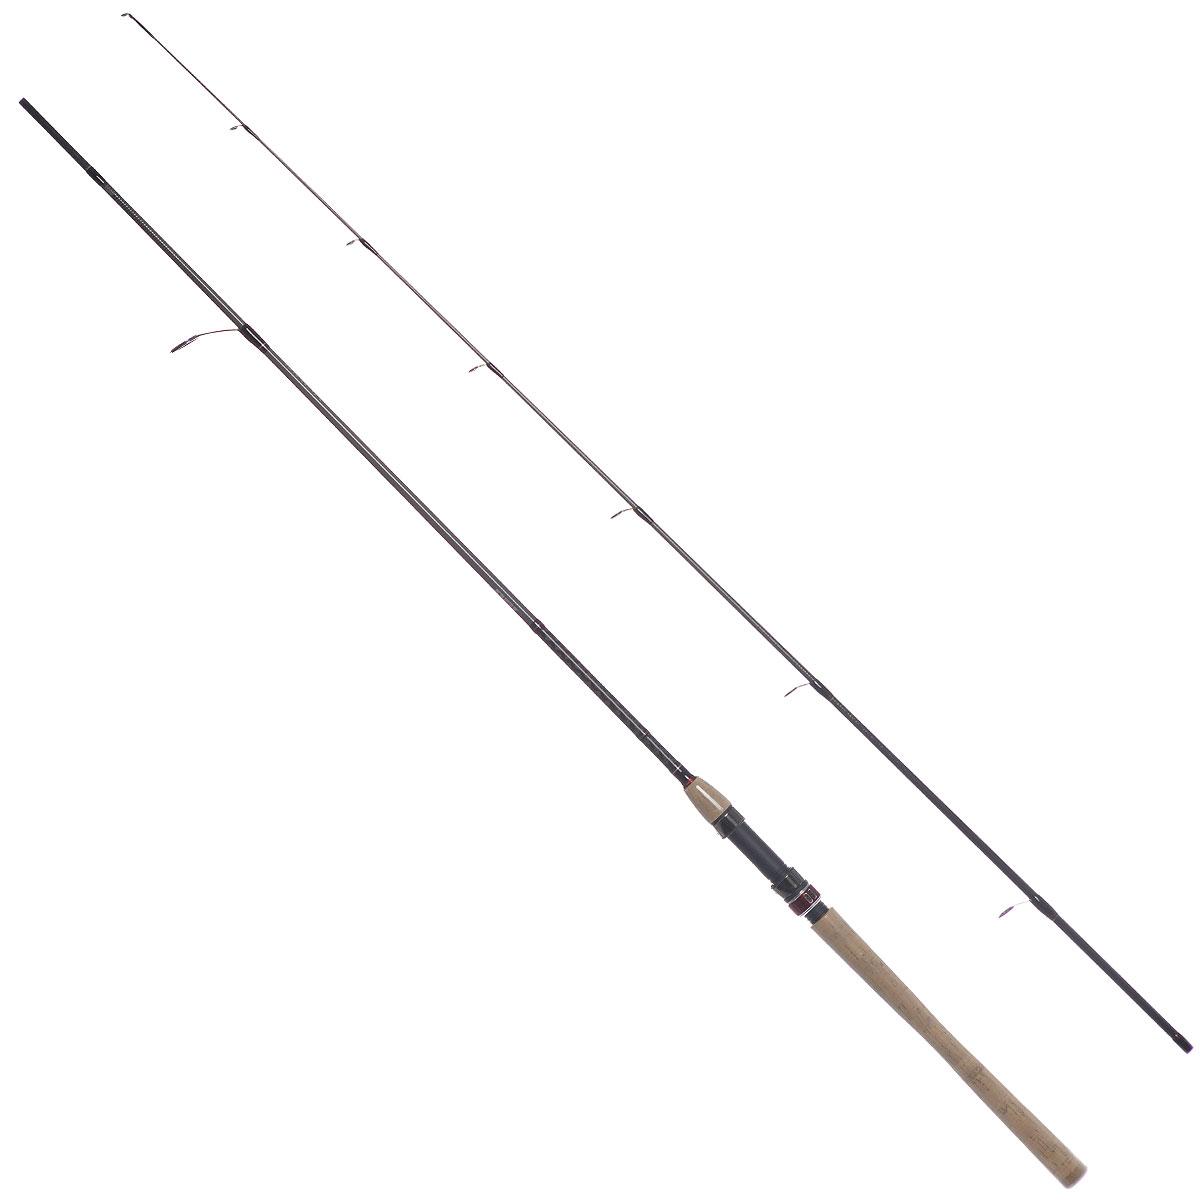 Спиннинг штекерный Daiwa Procaster Spinning, 2,10 м, 3-15 г